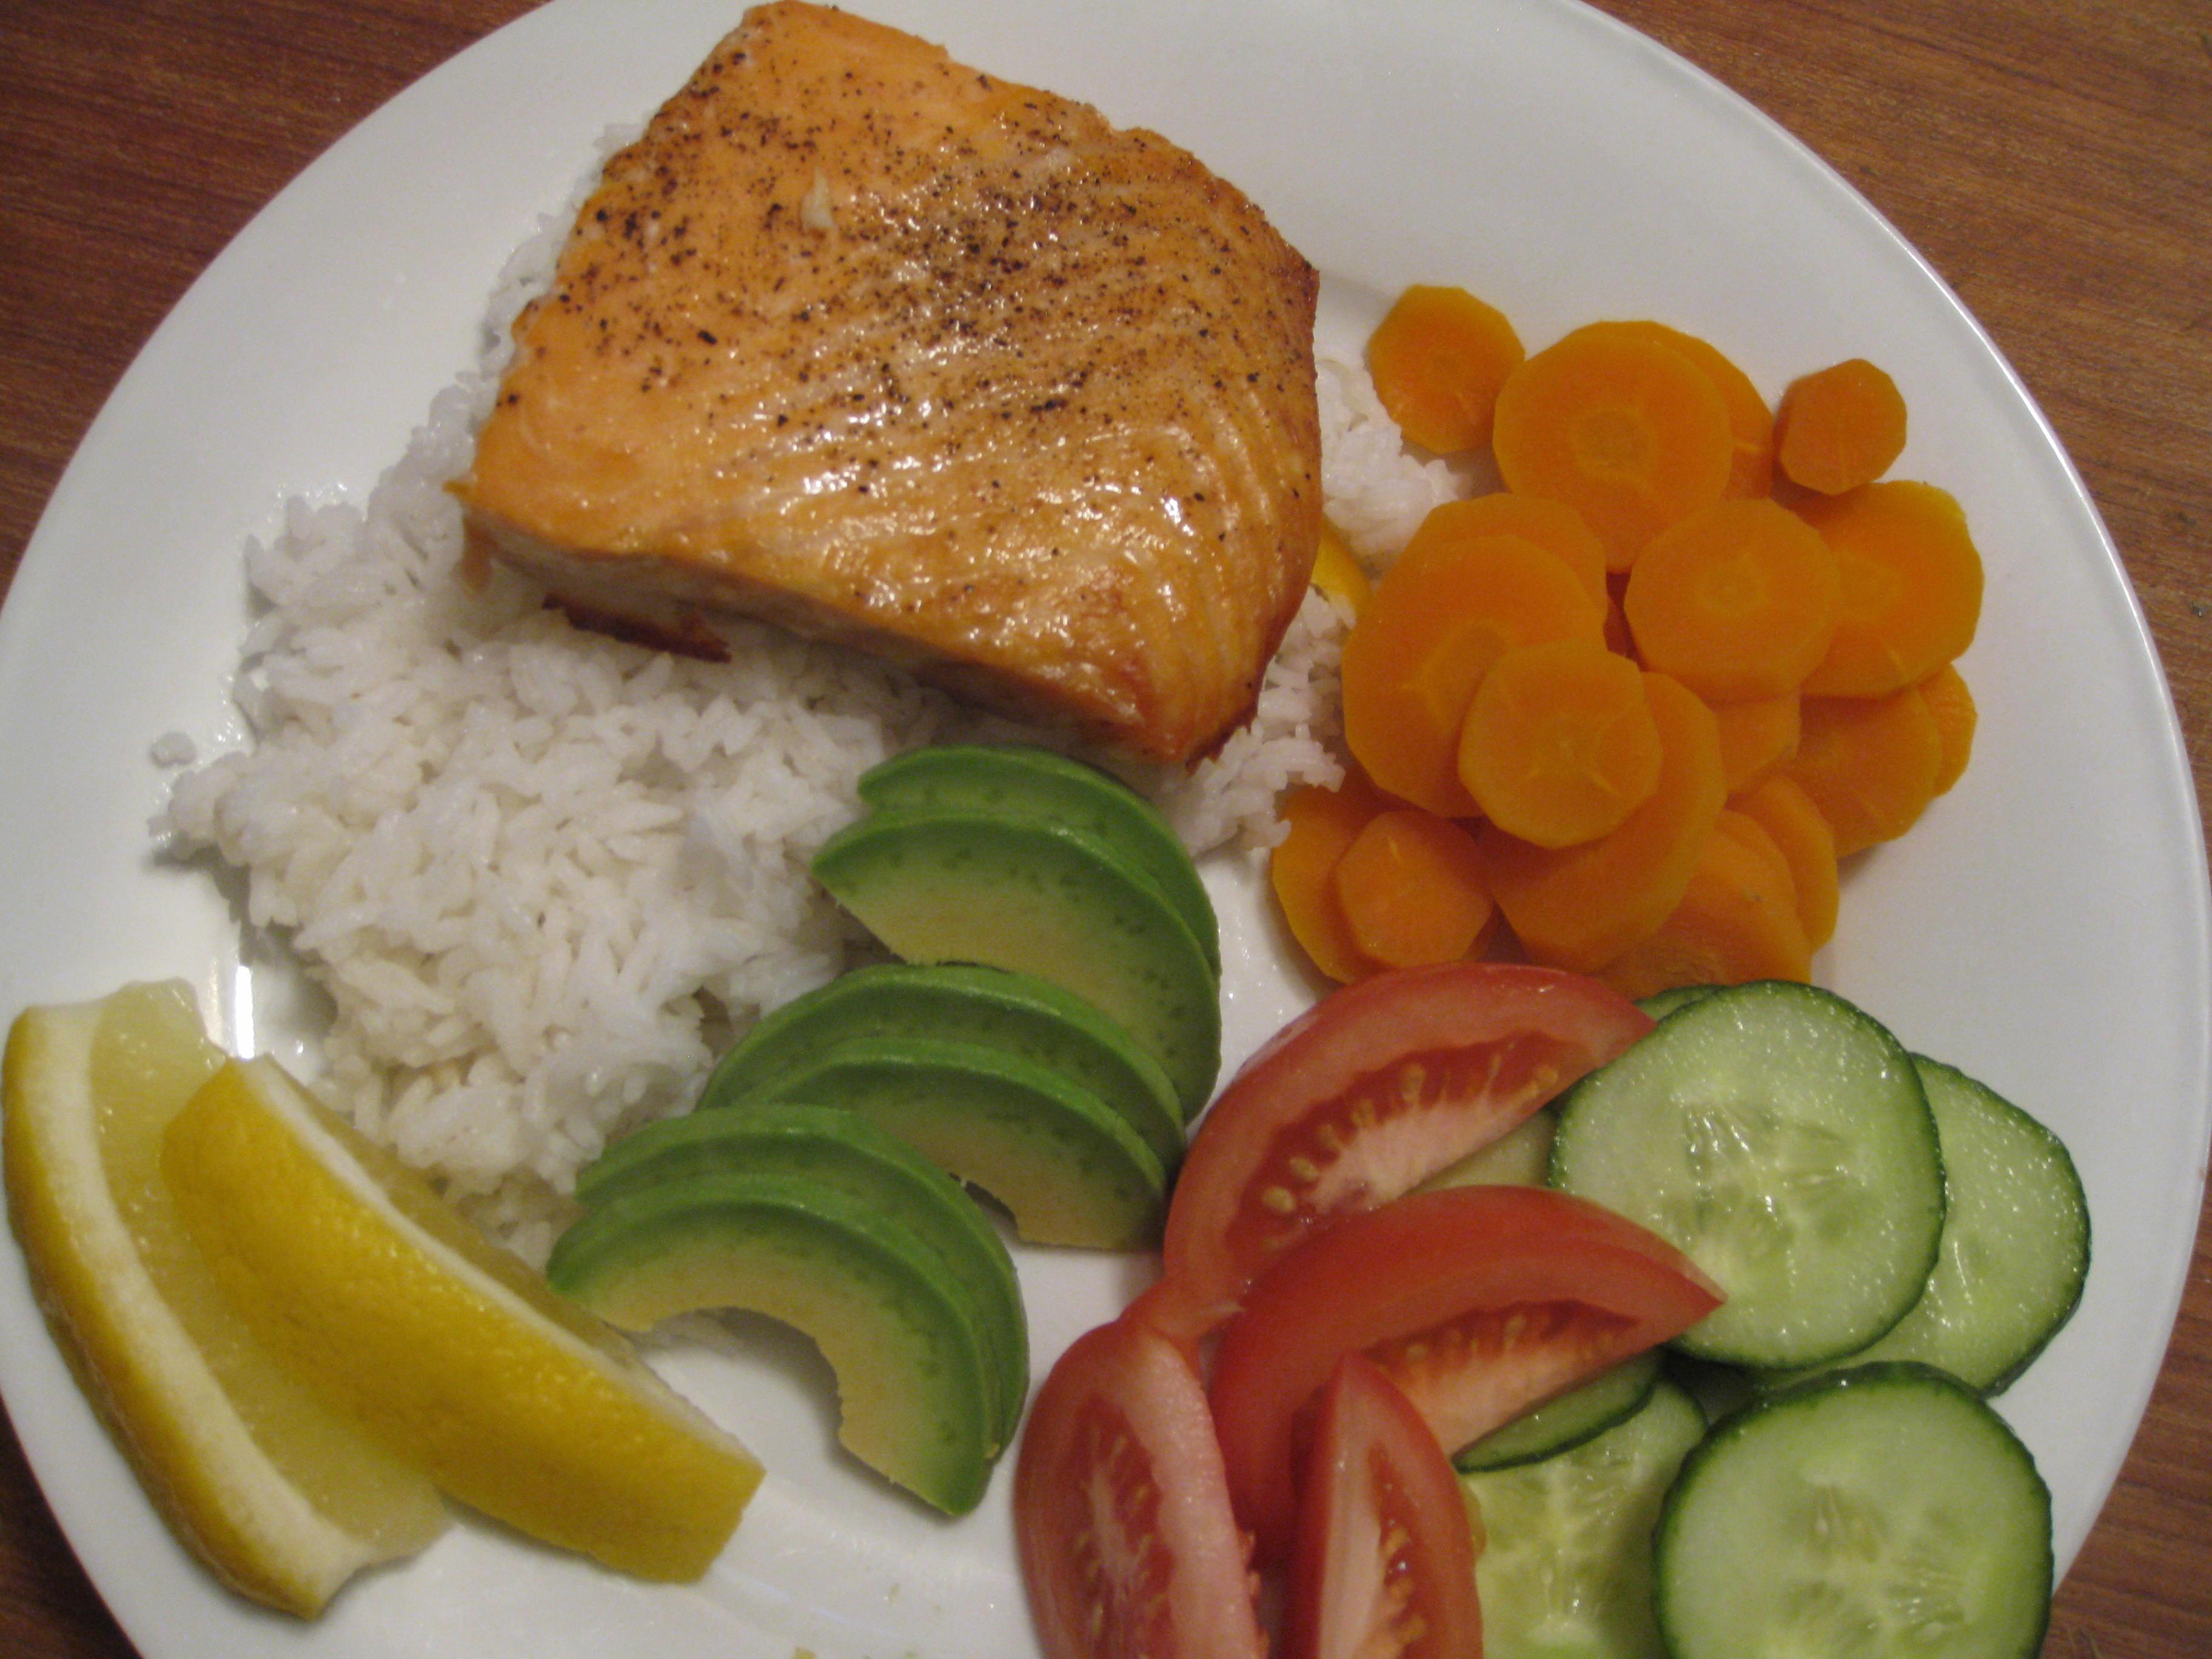 Recipe – Pan Fry Salmon on Rice with Veggies